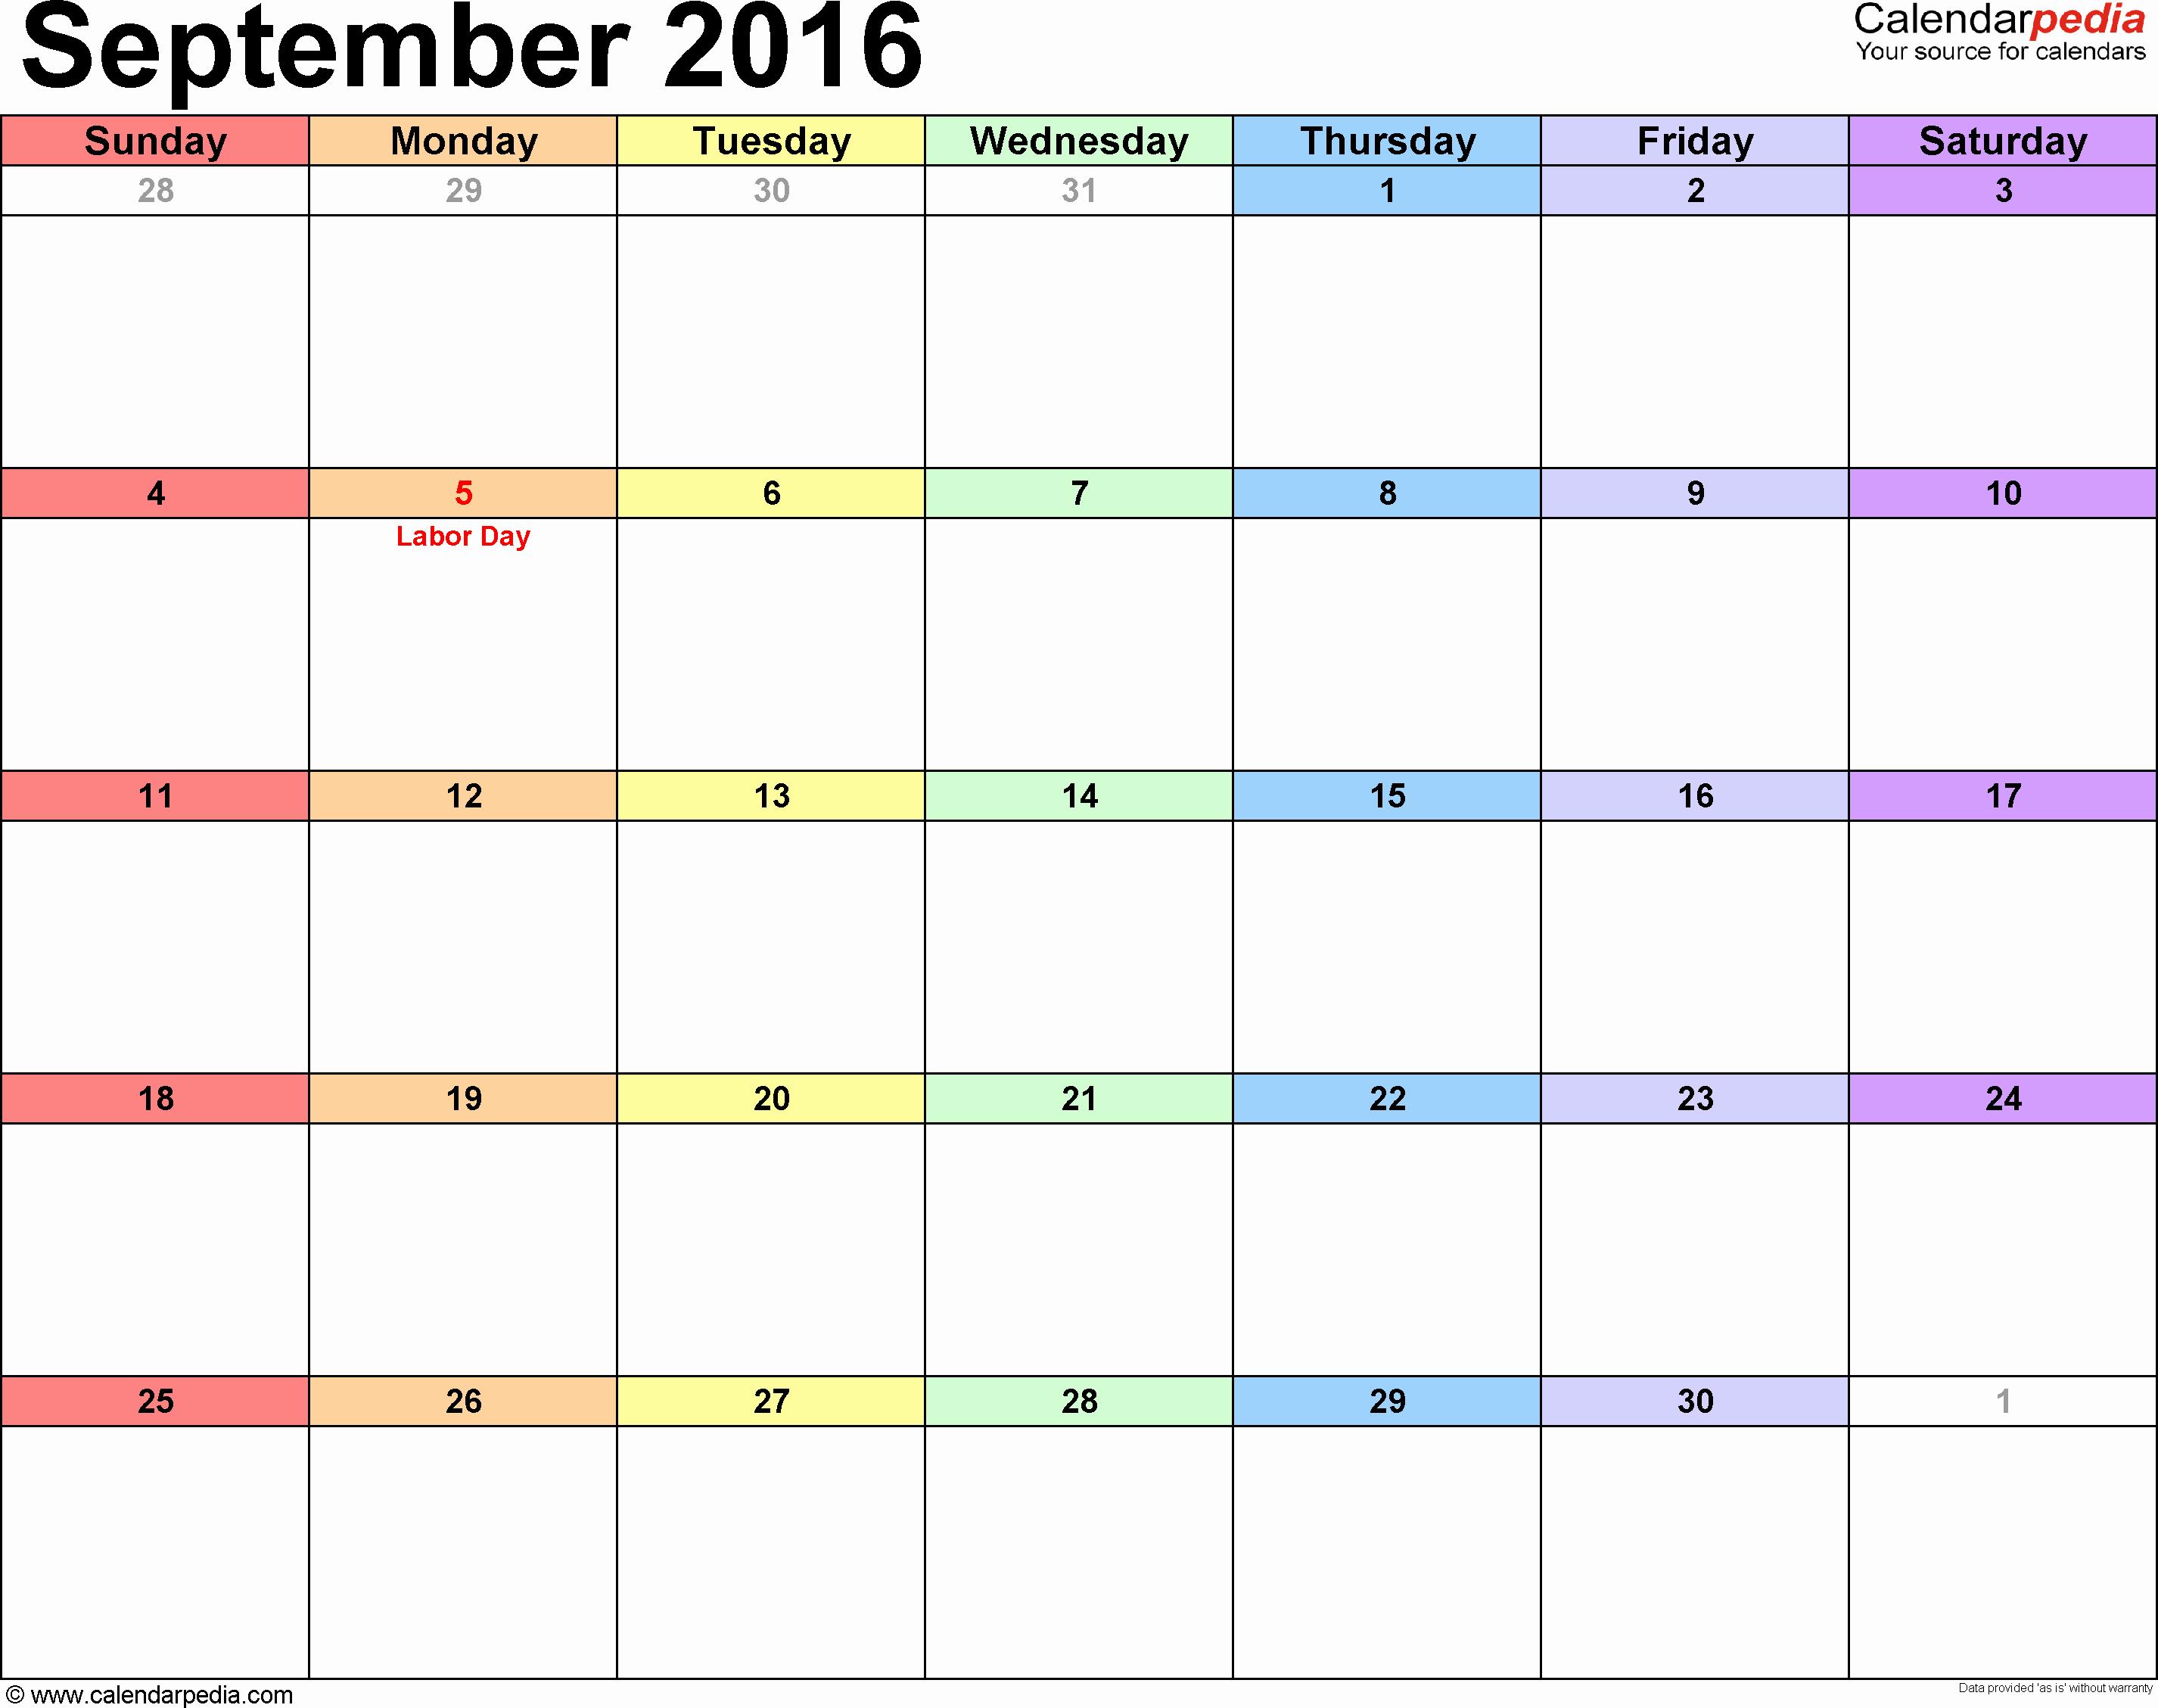 September 2017 Printable Calendar Word Inspirational September 2016 Calendars for Word Excel & Pdf